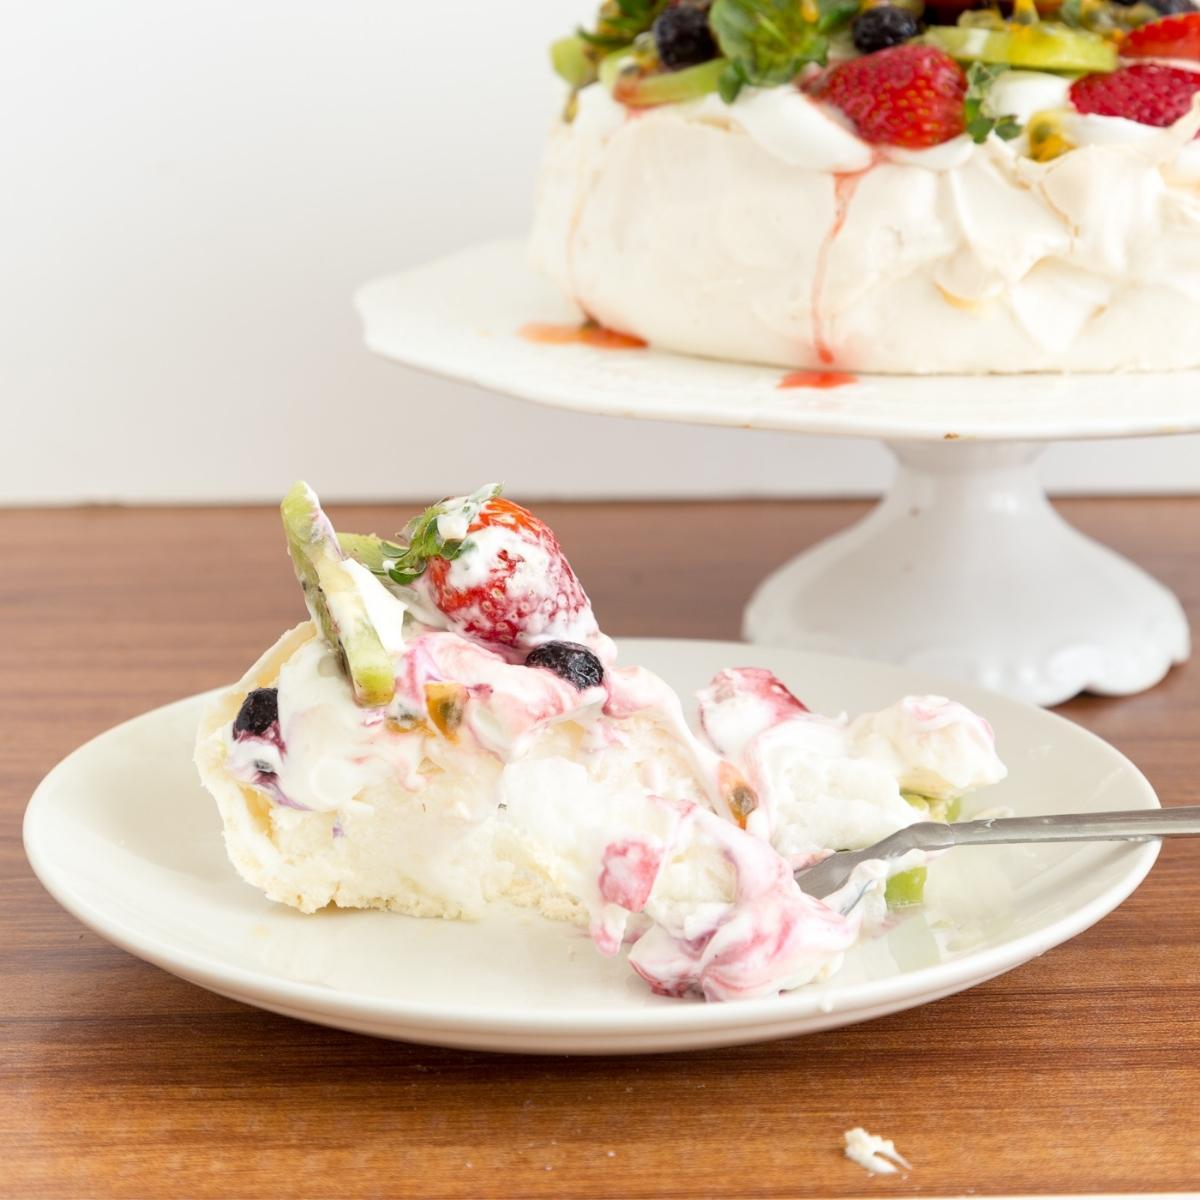 Slice of pavlova with whipped cream.